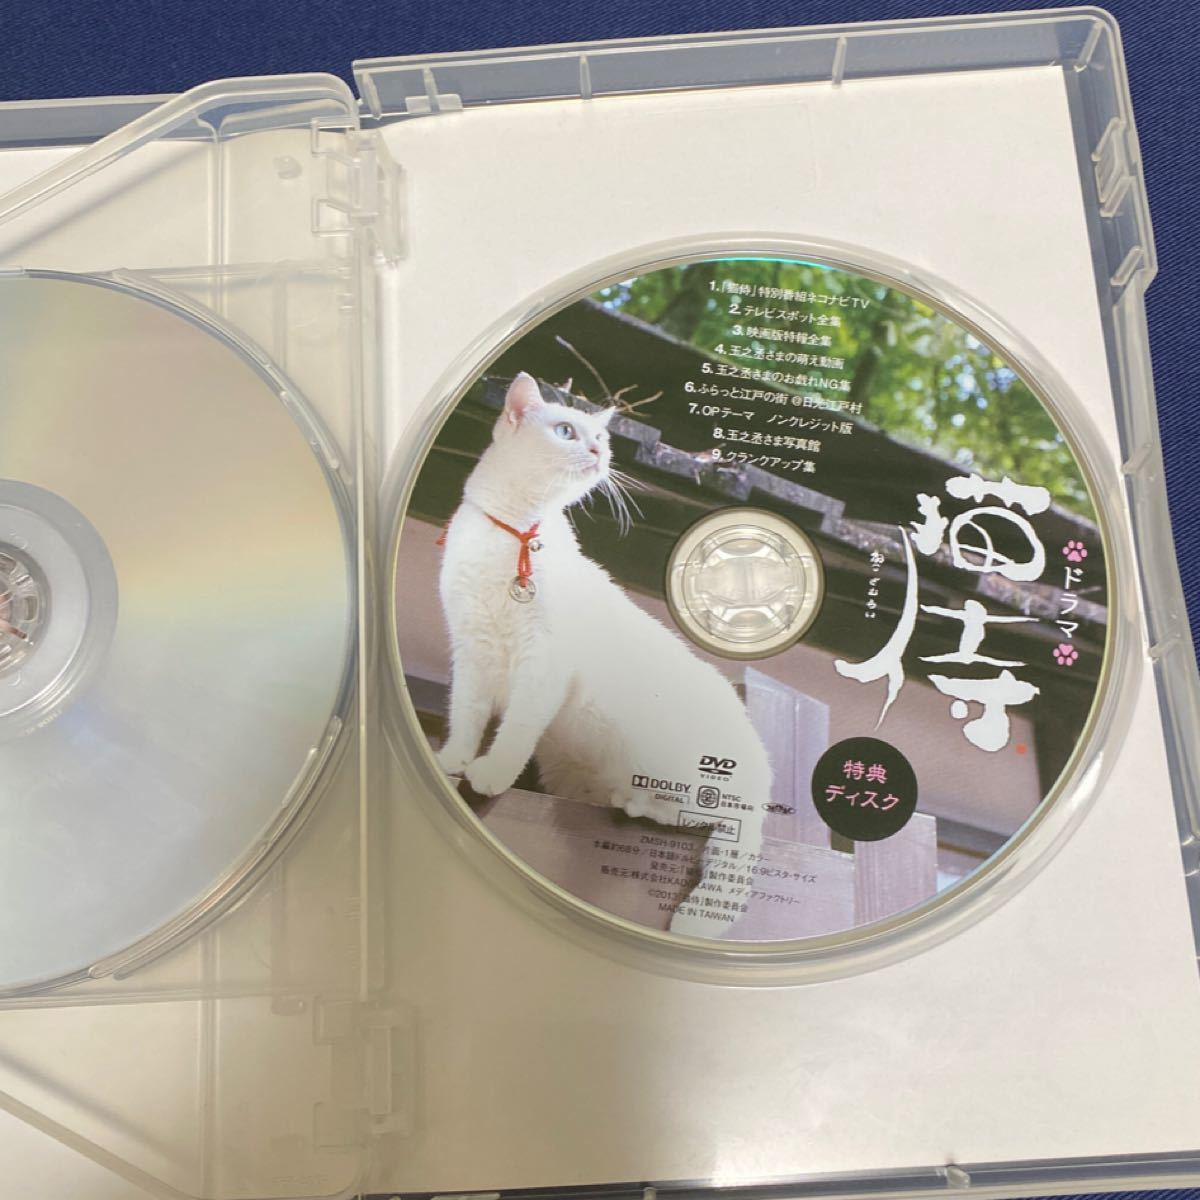 TVドラマDVD ドラマ「猫侍」DVD-BOX